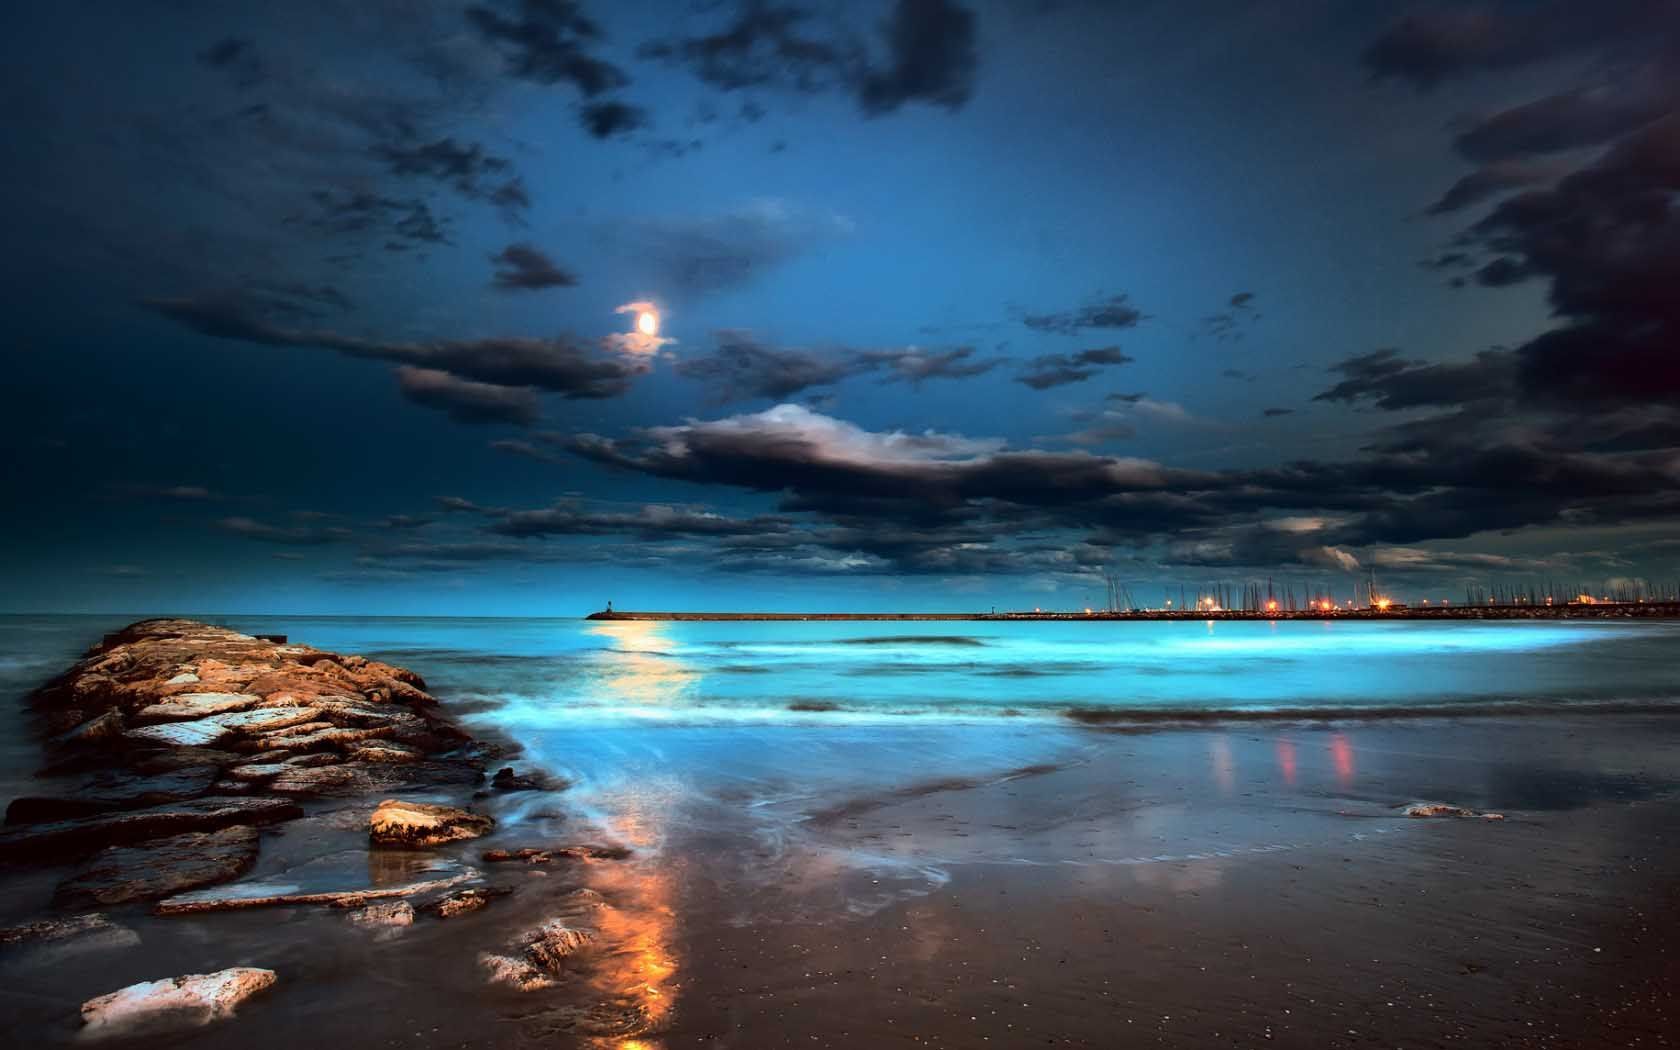 Beautiful Beach Night Wallpapers In Hd For Desktop Fondos De Pantalla Iphone Tumblr Paisajes Italia